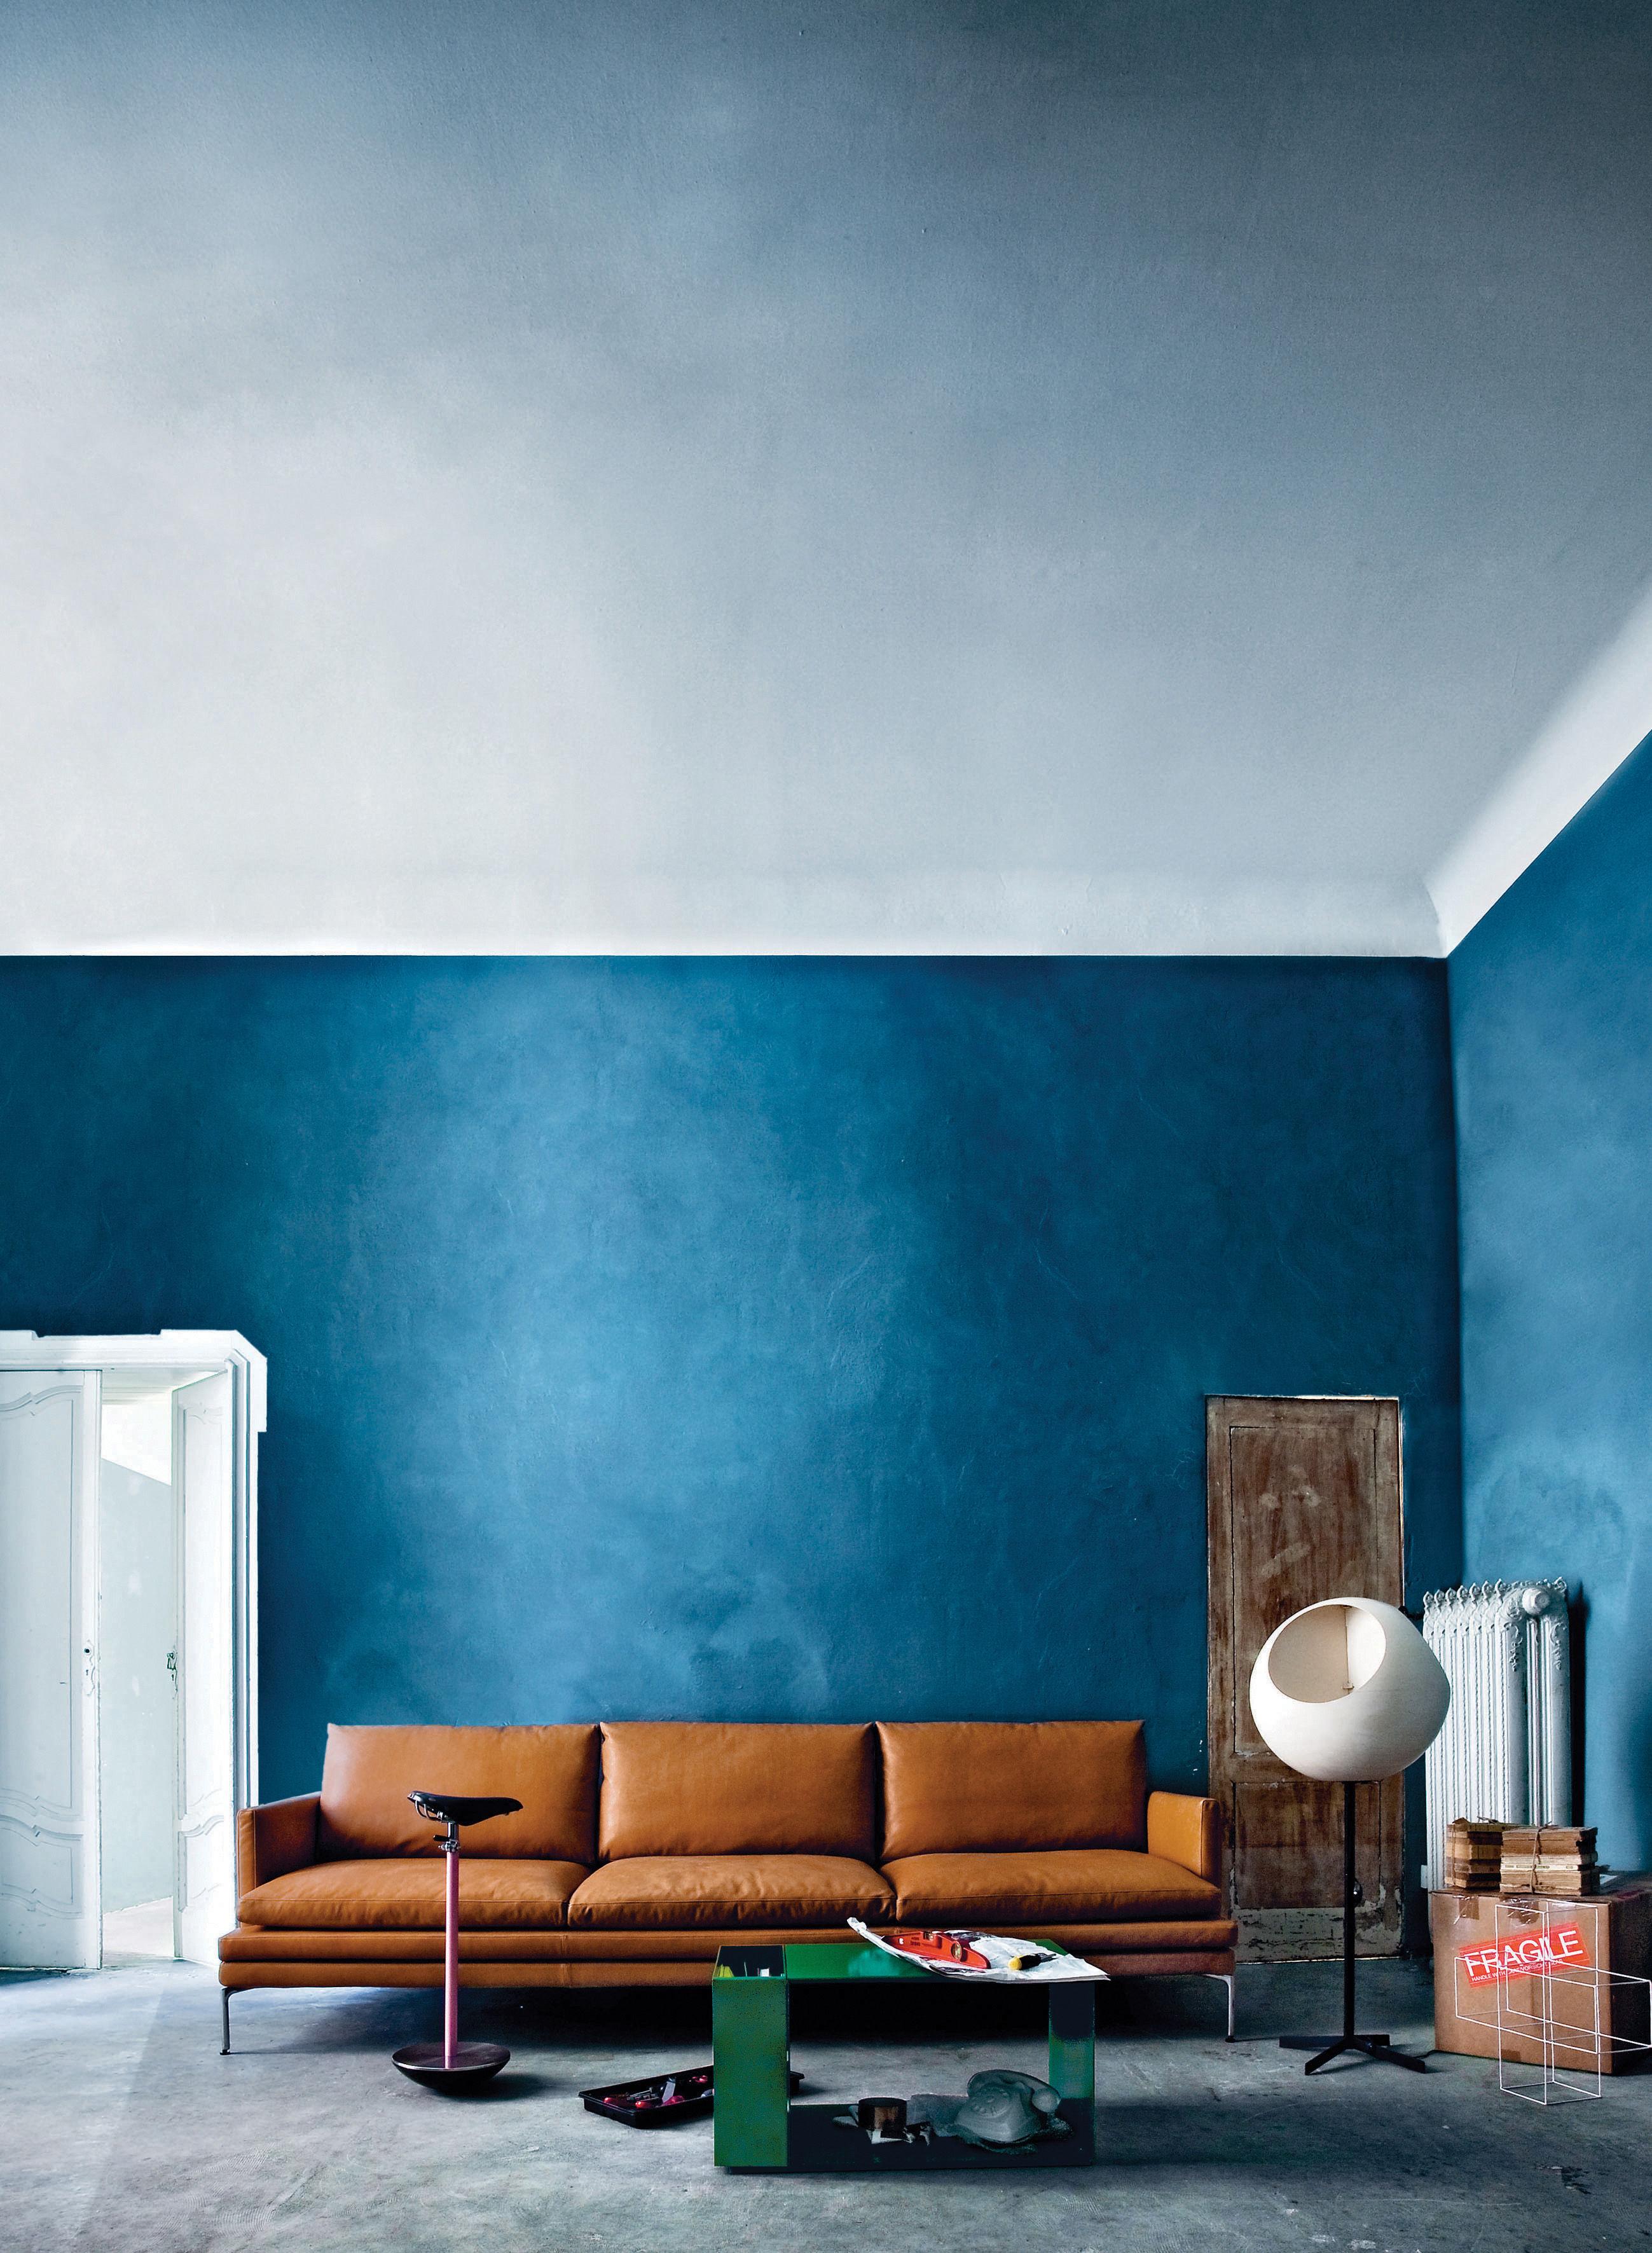 canap droit william cuir 3 places l 266 cm marron clair gold zanotta. Black Bedroom Furniture Sets. Home Design Ideas